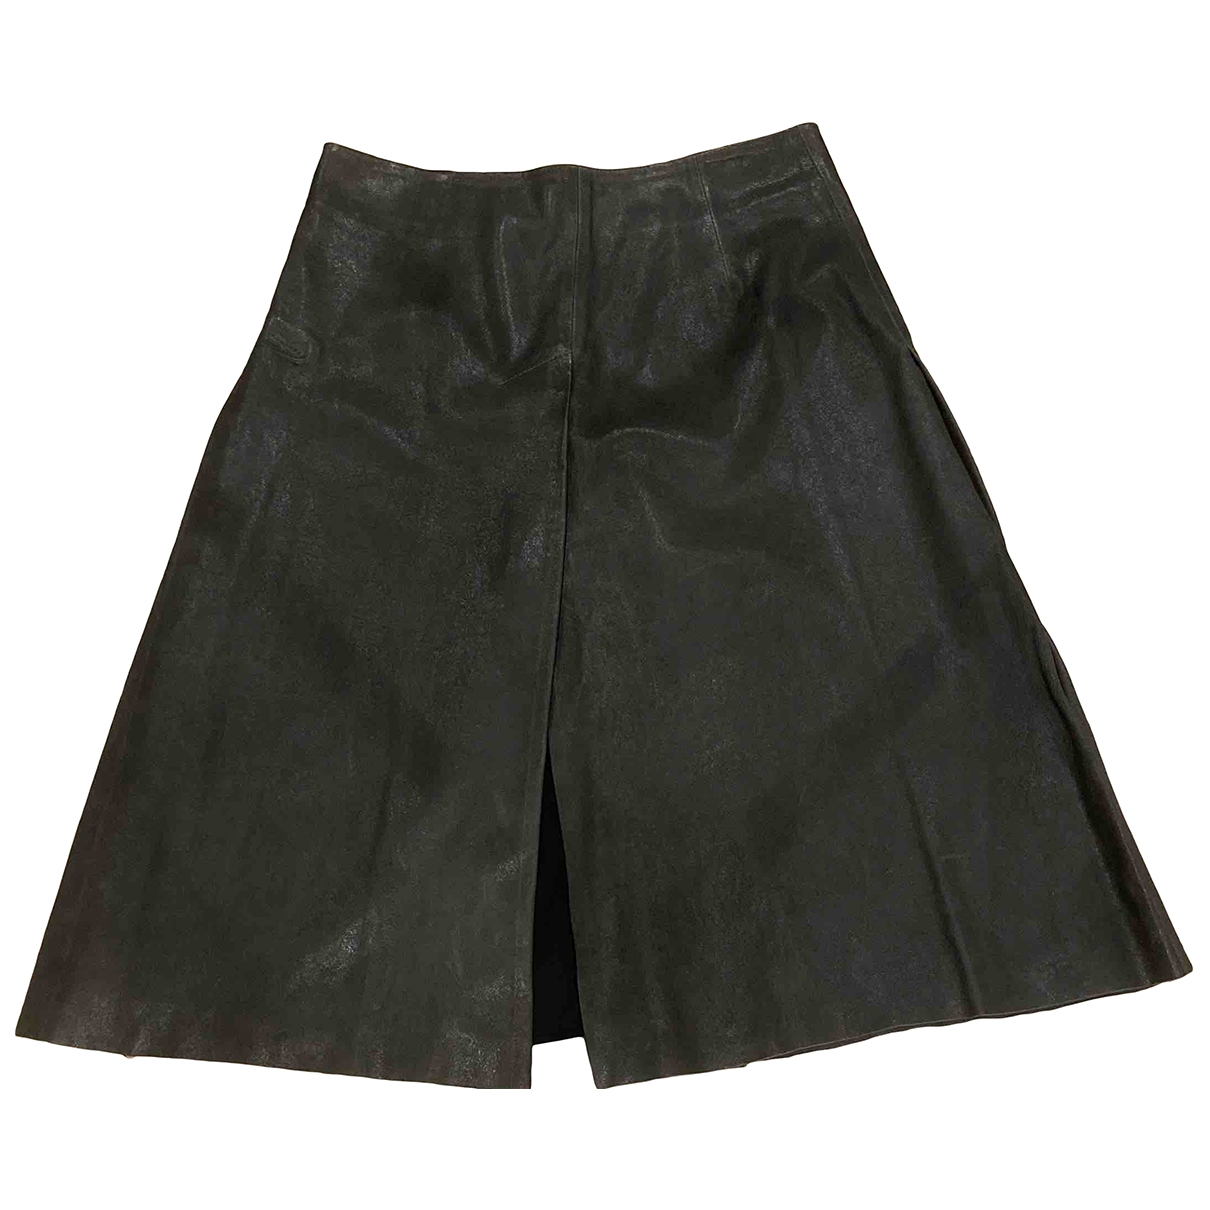 All Saints \N Grey Leather skirt for Women 10 UK